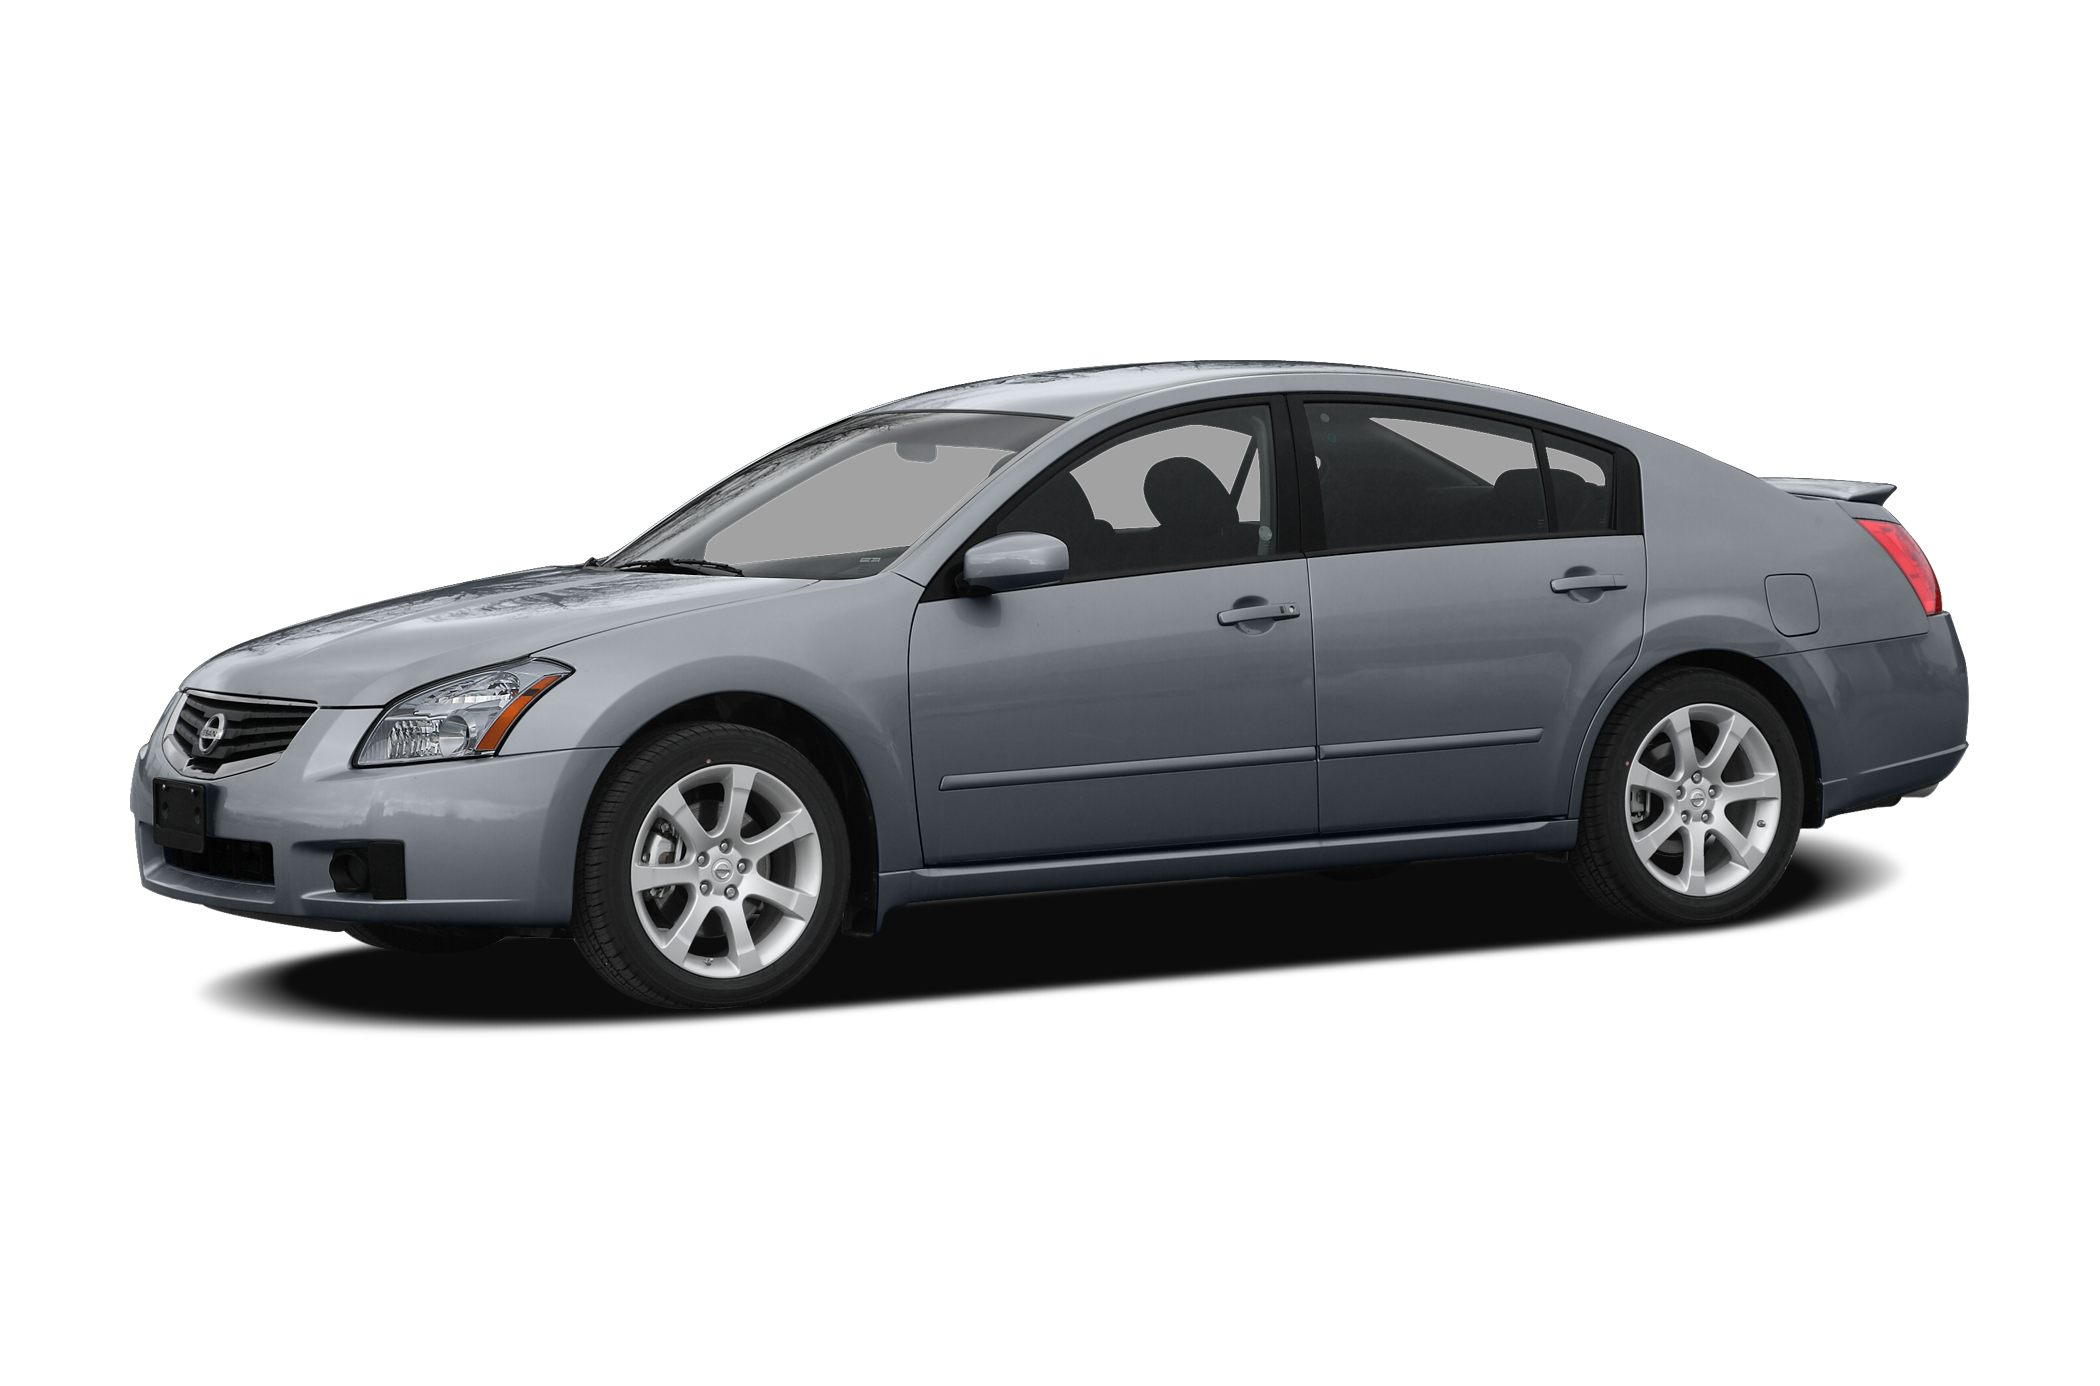 2008 Nissan Maxima  Miles 61622Color Gray Stock 17182 VIN 1N4BA41E88C839322